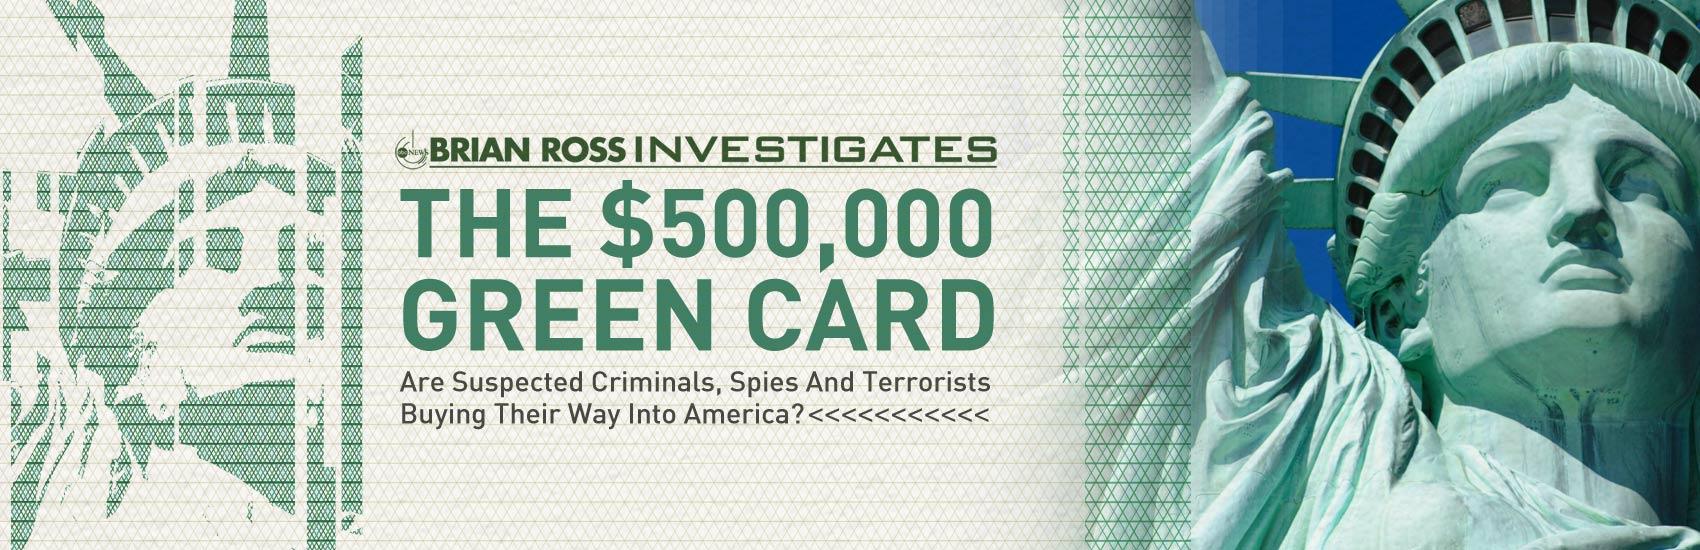 The $500,000 Green Card | The EB-5 Visa Program - ABC News